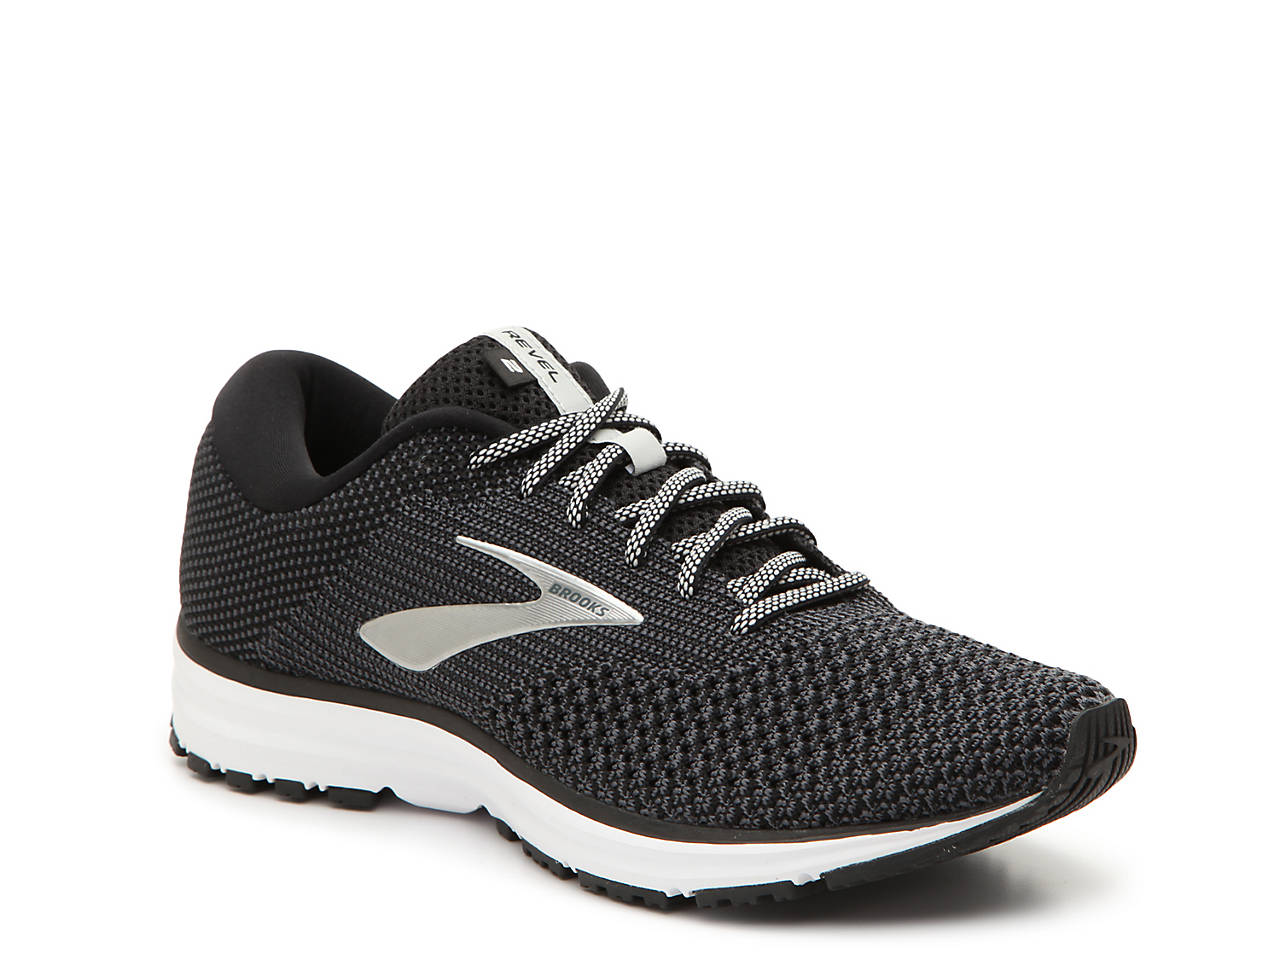 5c53c822614 Brooks Revel 2 Performance Running Shoe - Women s Women s Shoes